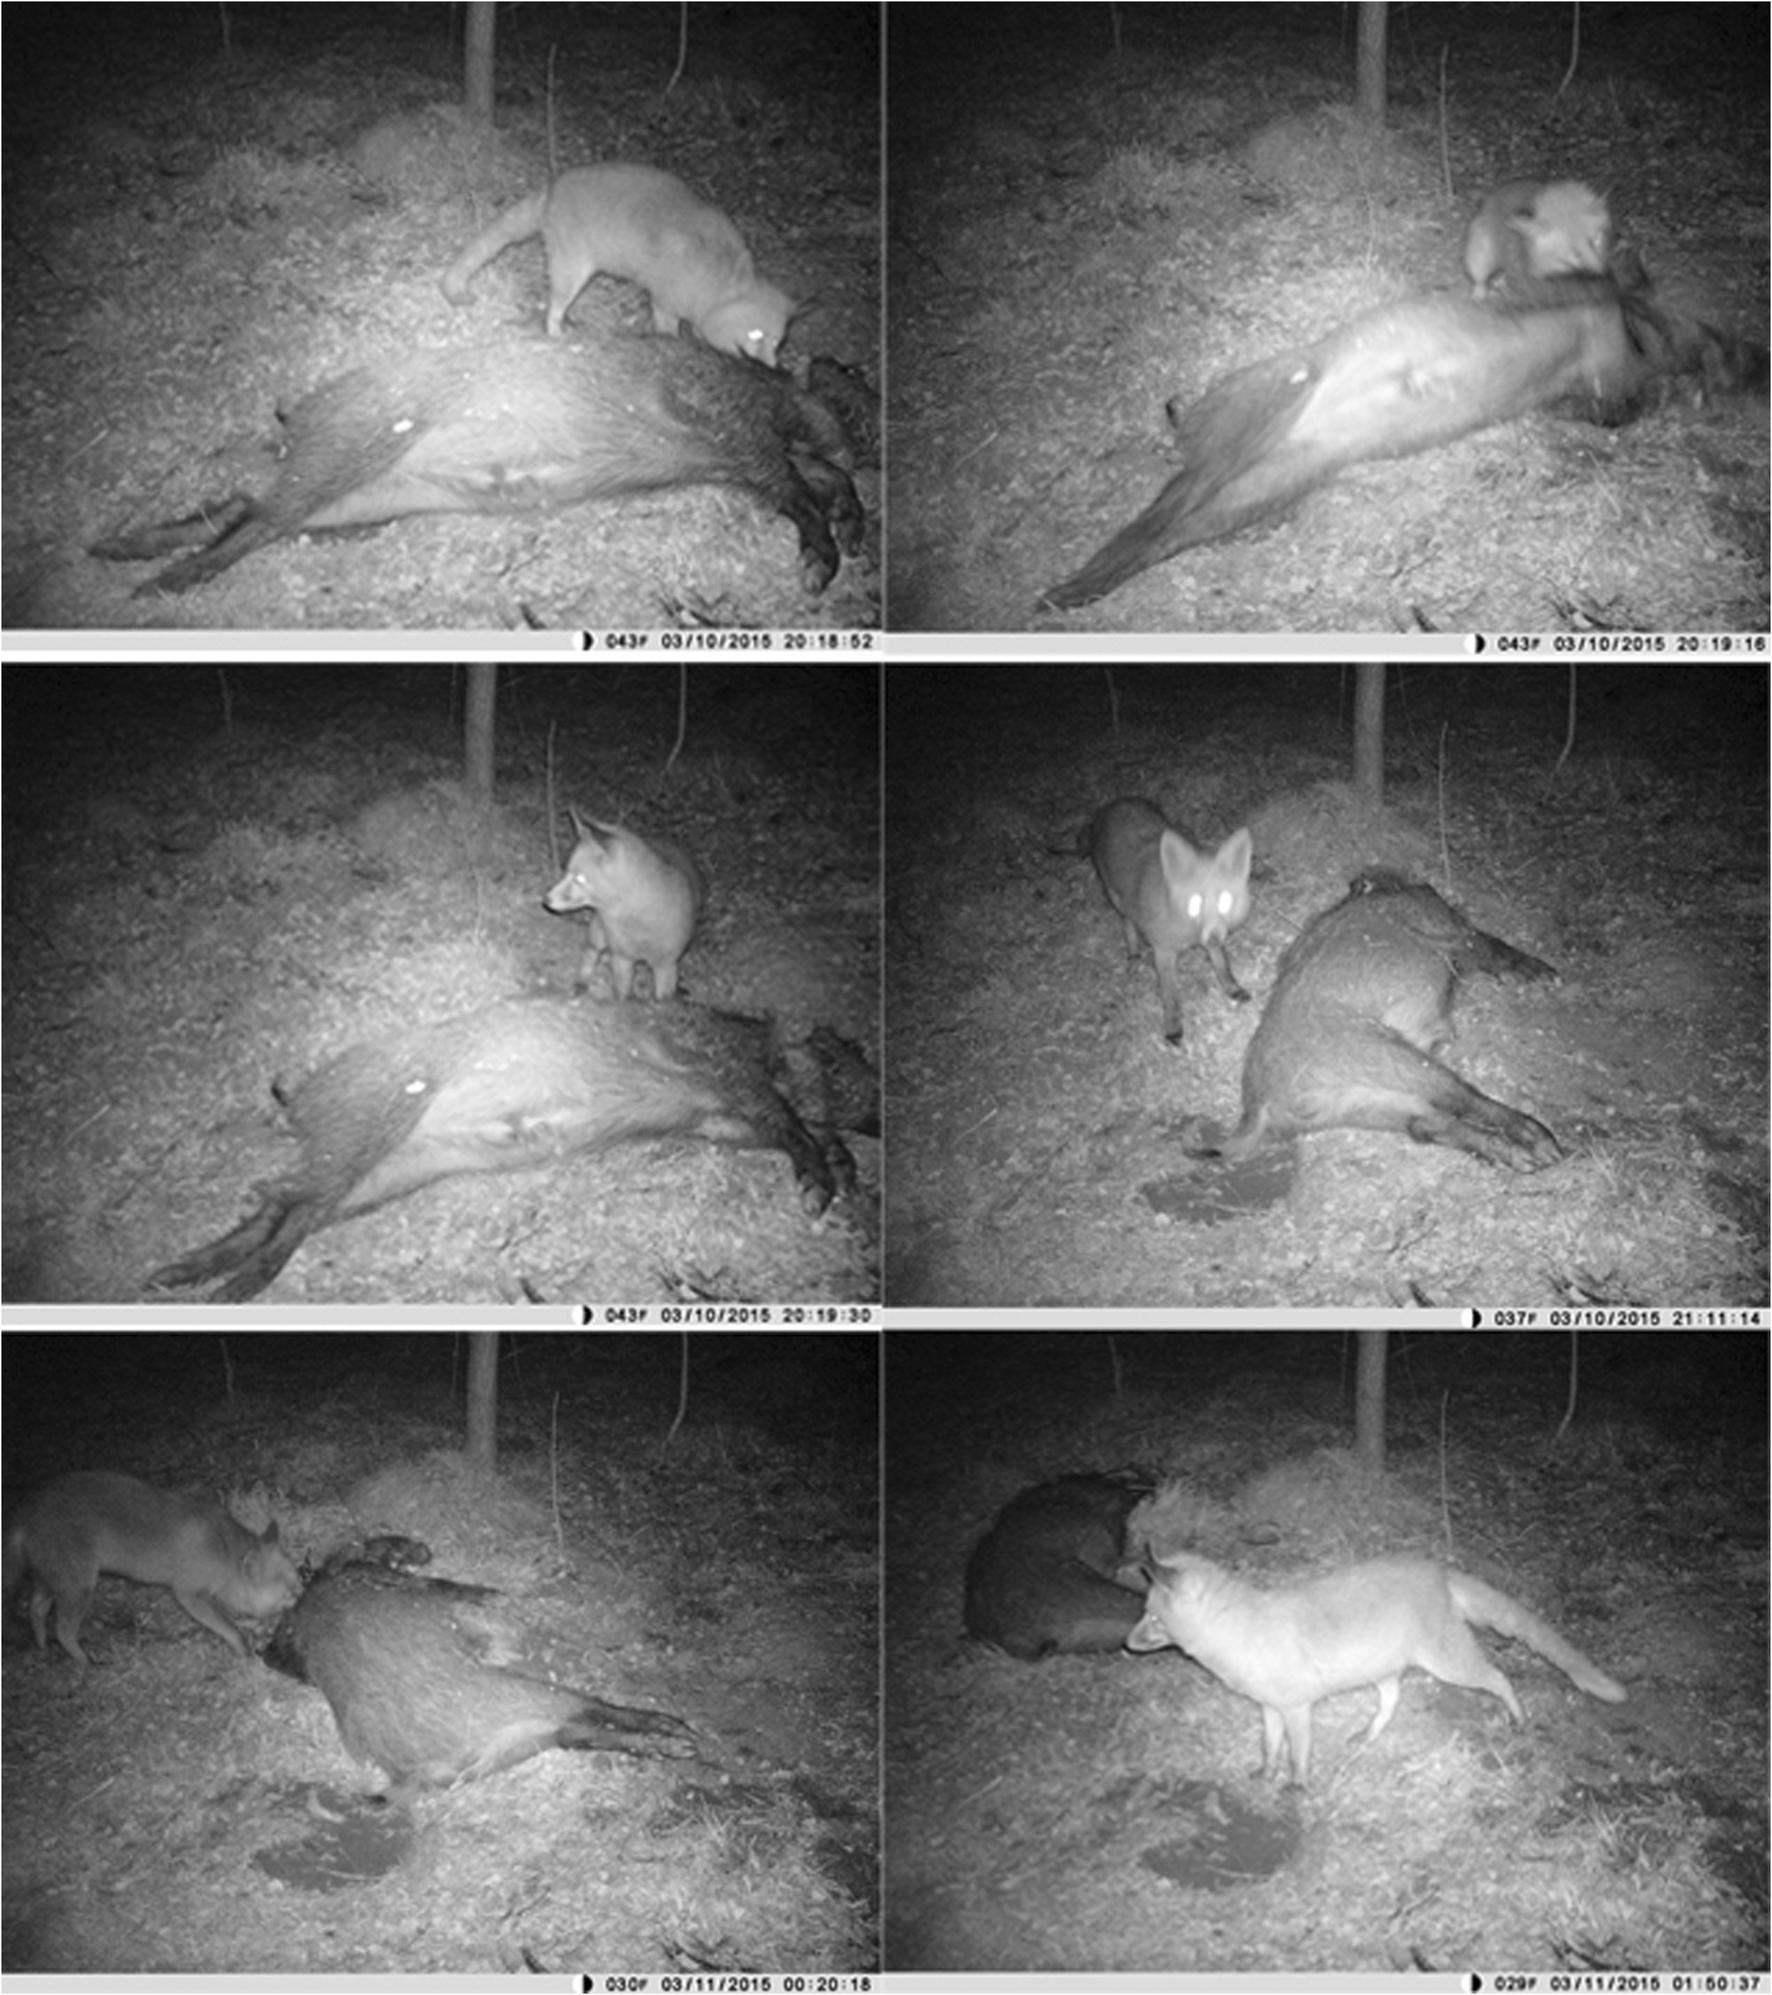 Contributing to characterise wild predator behaviour